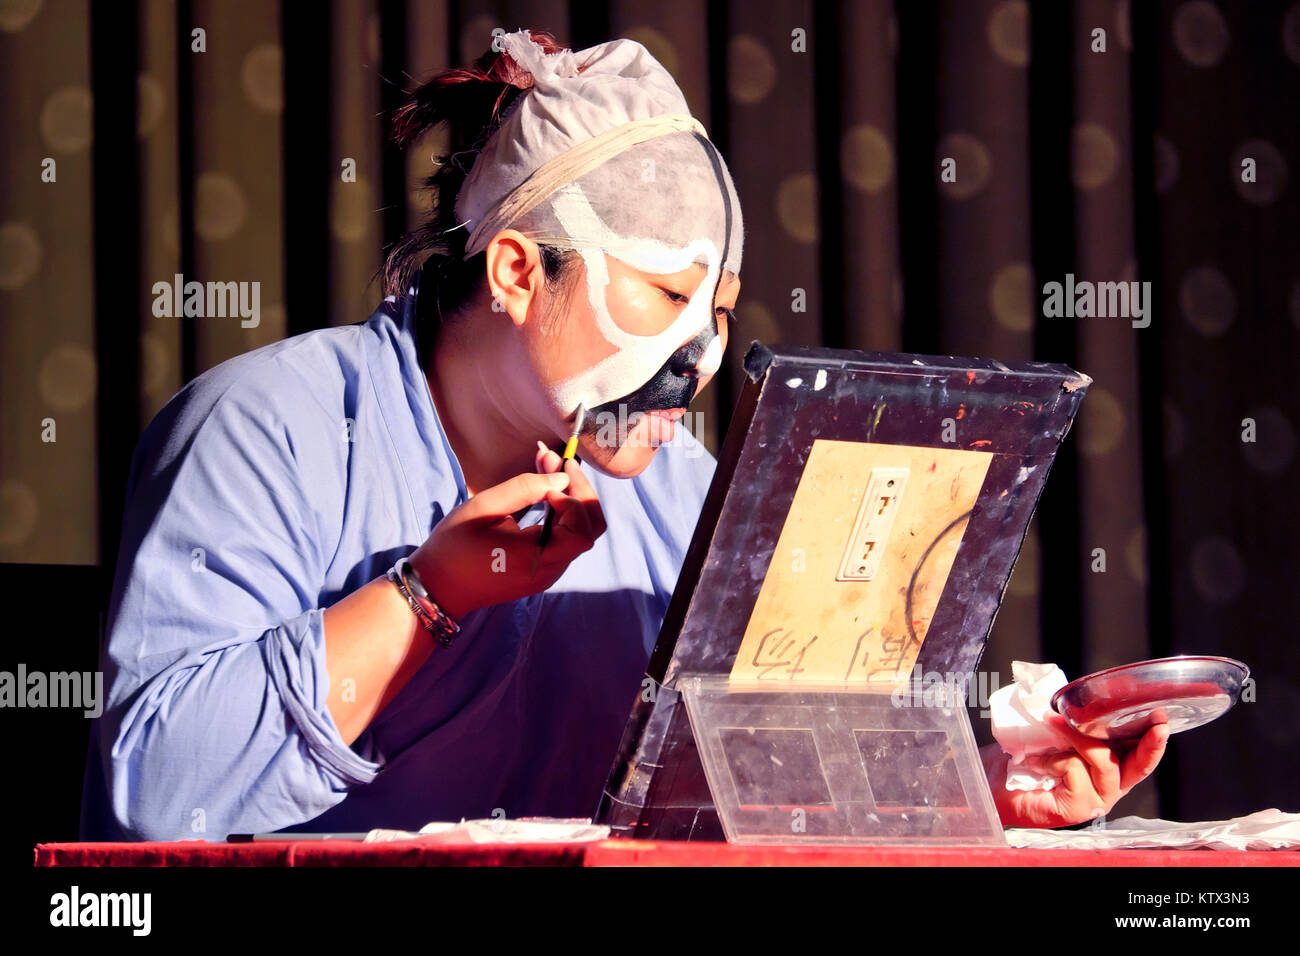 A Peking Opera actor applying makeup, Liyuan Theatre, Beijing, China - Stock Image